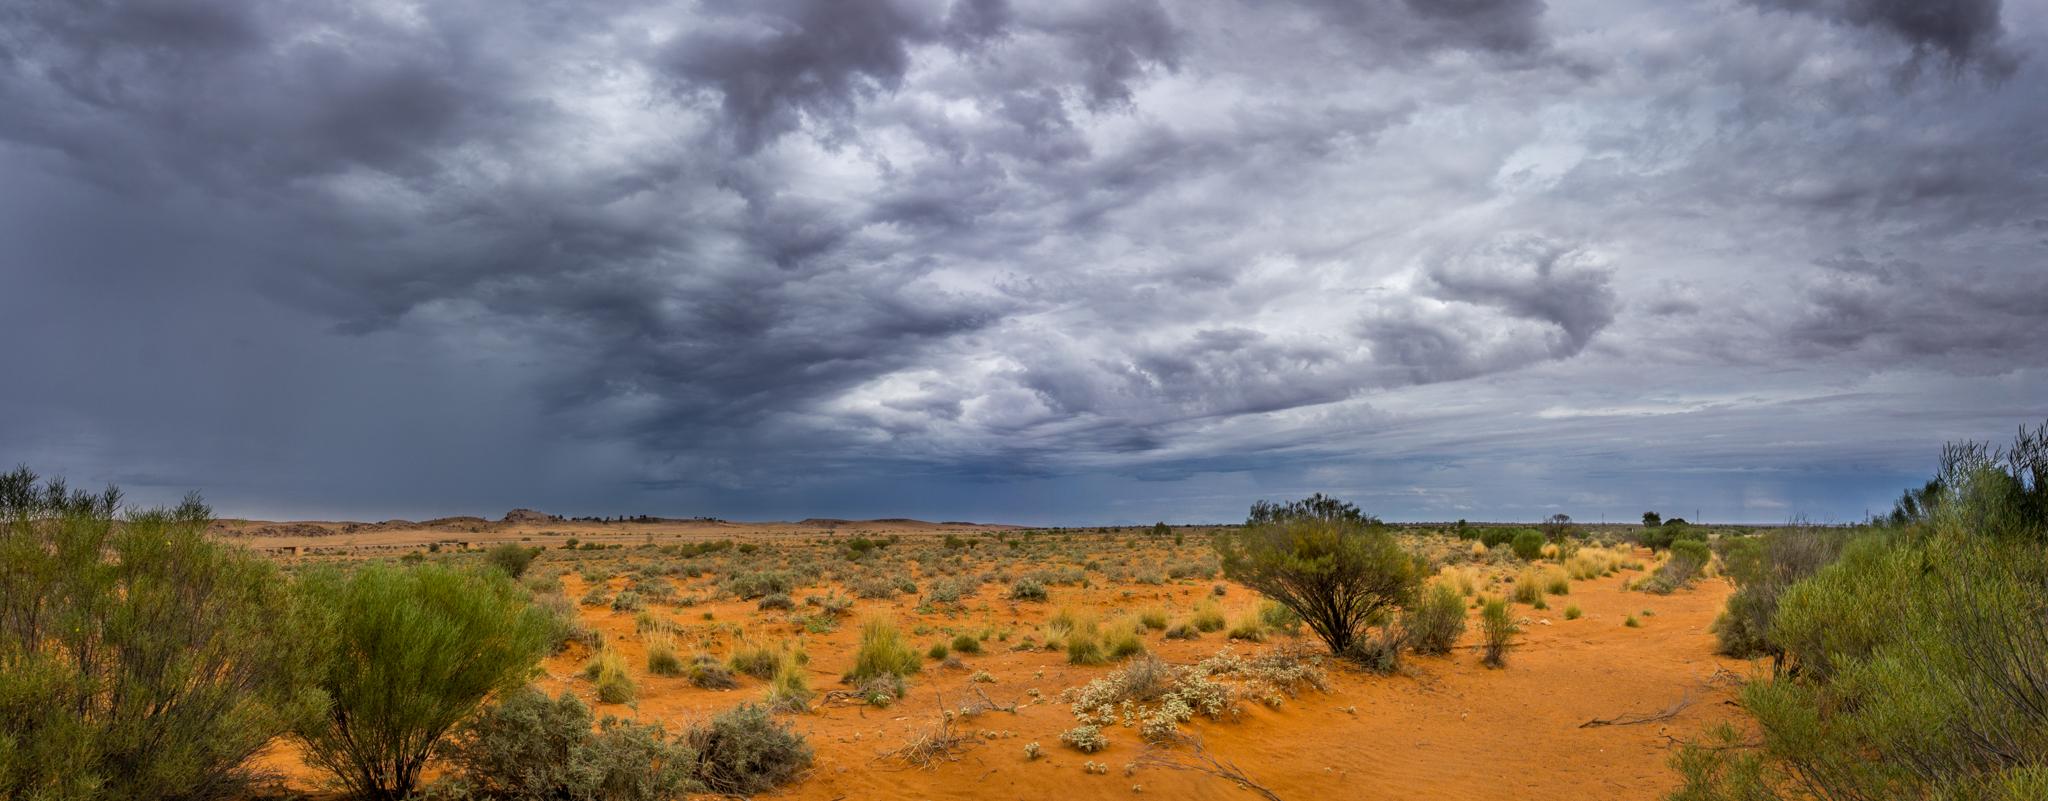 Outback Highway near Beltana, Australia